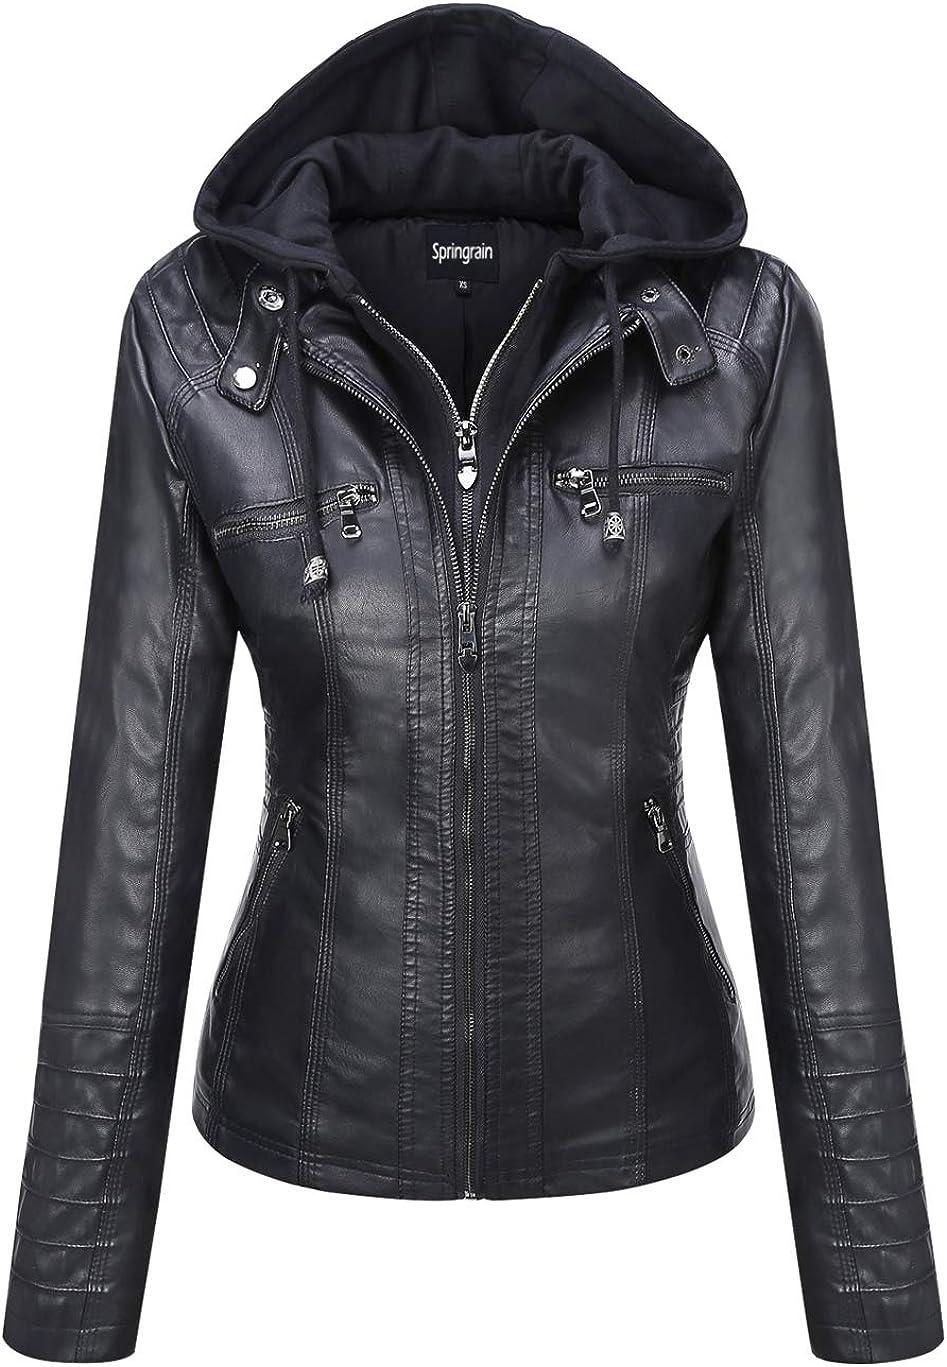 Springrain Women's Casual Stand Collar Detachable Hood PU Leather Jacket